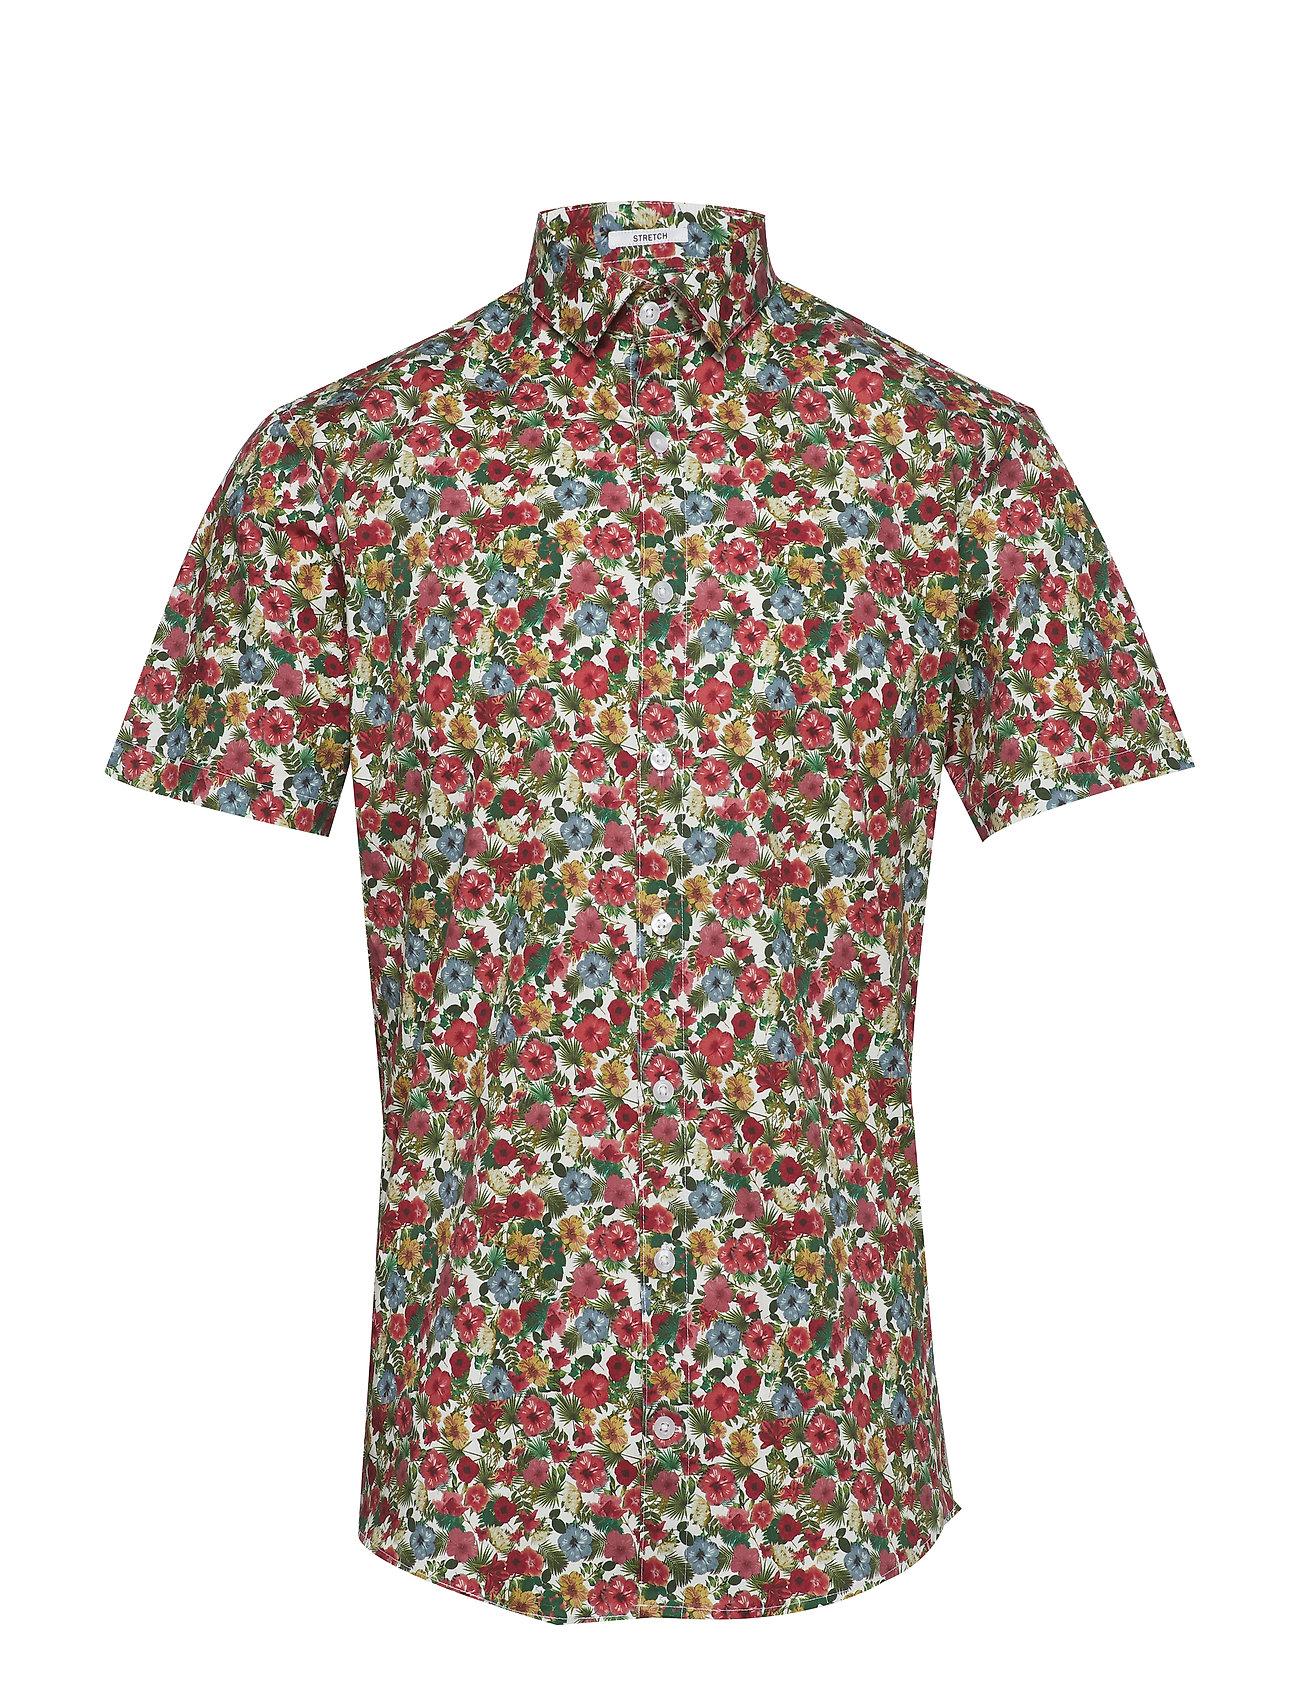 Printed Printed S sredLindbergh Shirt Shirt Printed S sredLindbergh Printed S sredLindbergh Shirt cTFJKl1